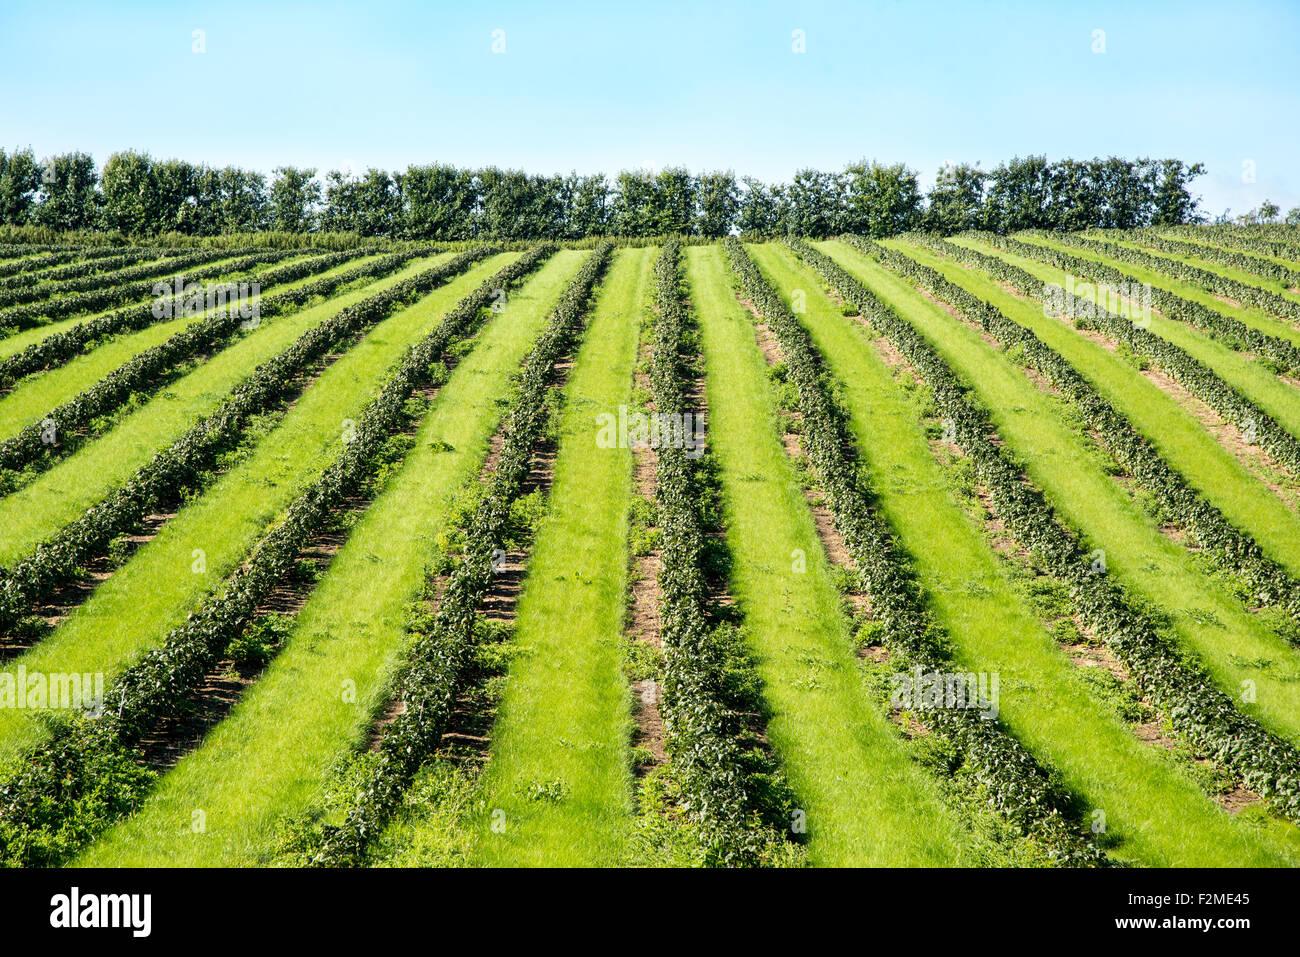 Rows of soft fruit plants create a bold pattern in a field near Faversham, Kent. Stock Photo